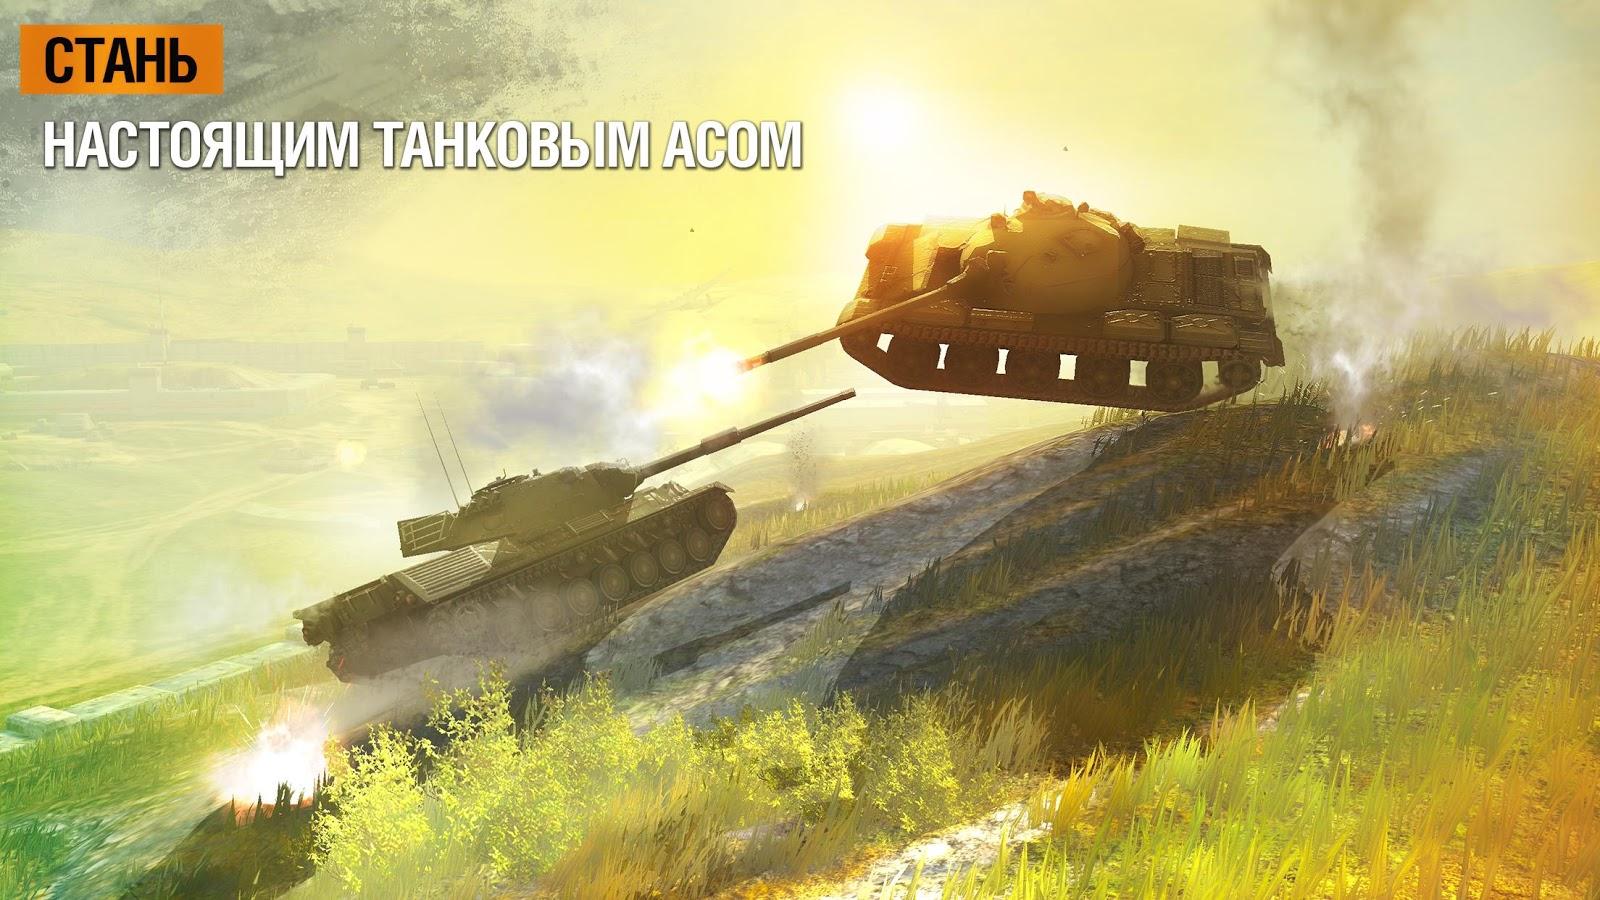 World of tanks blitz wallpaper for android mod apk 2020